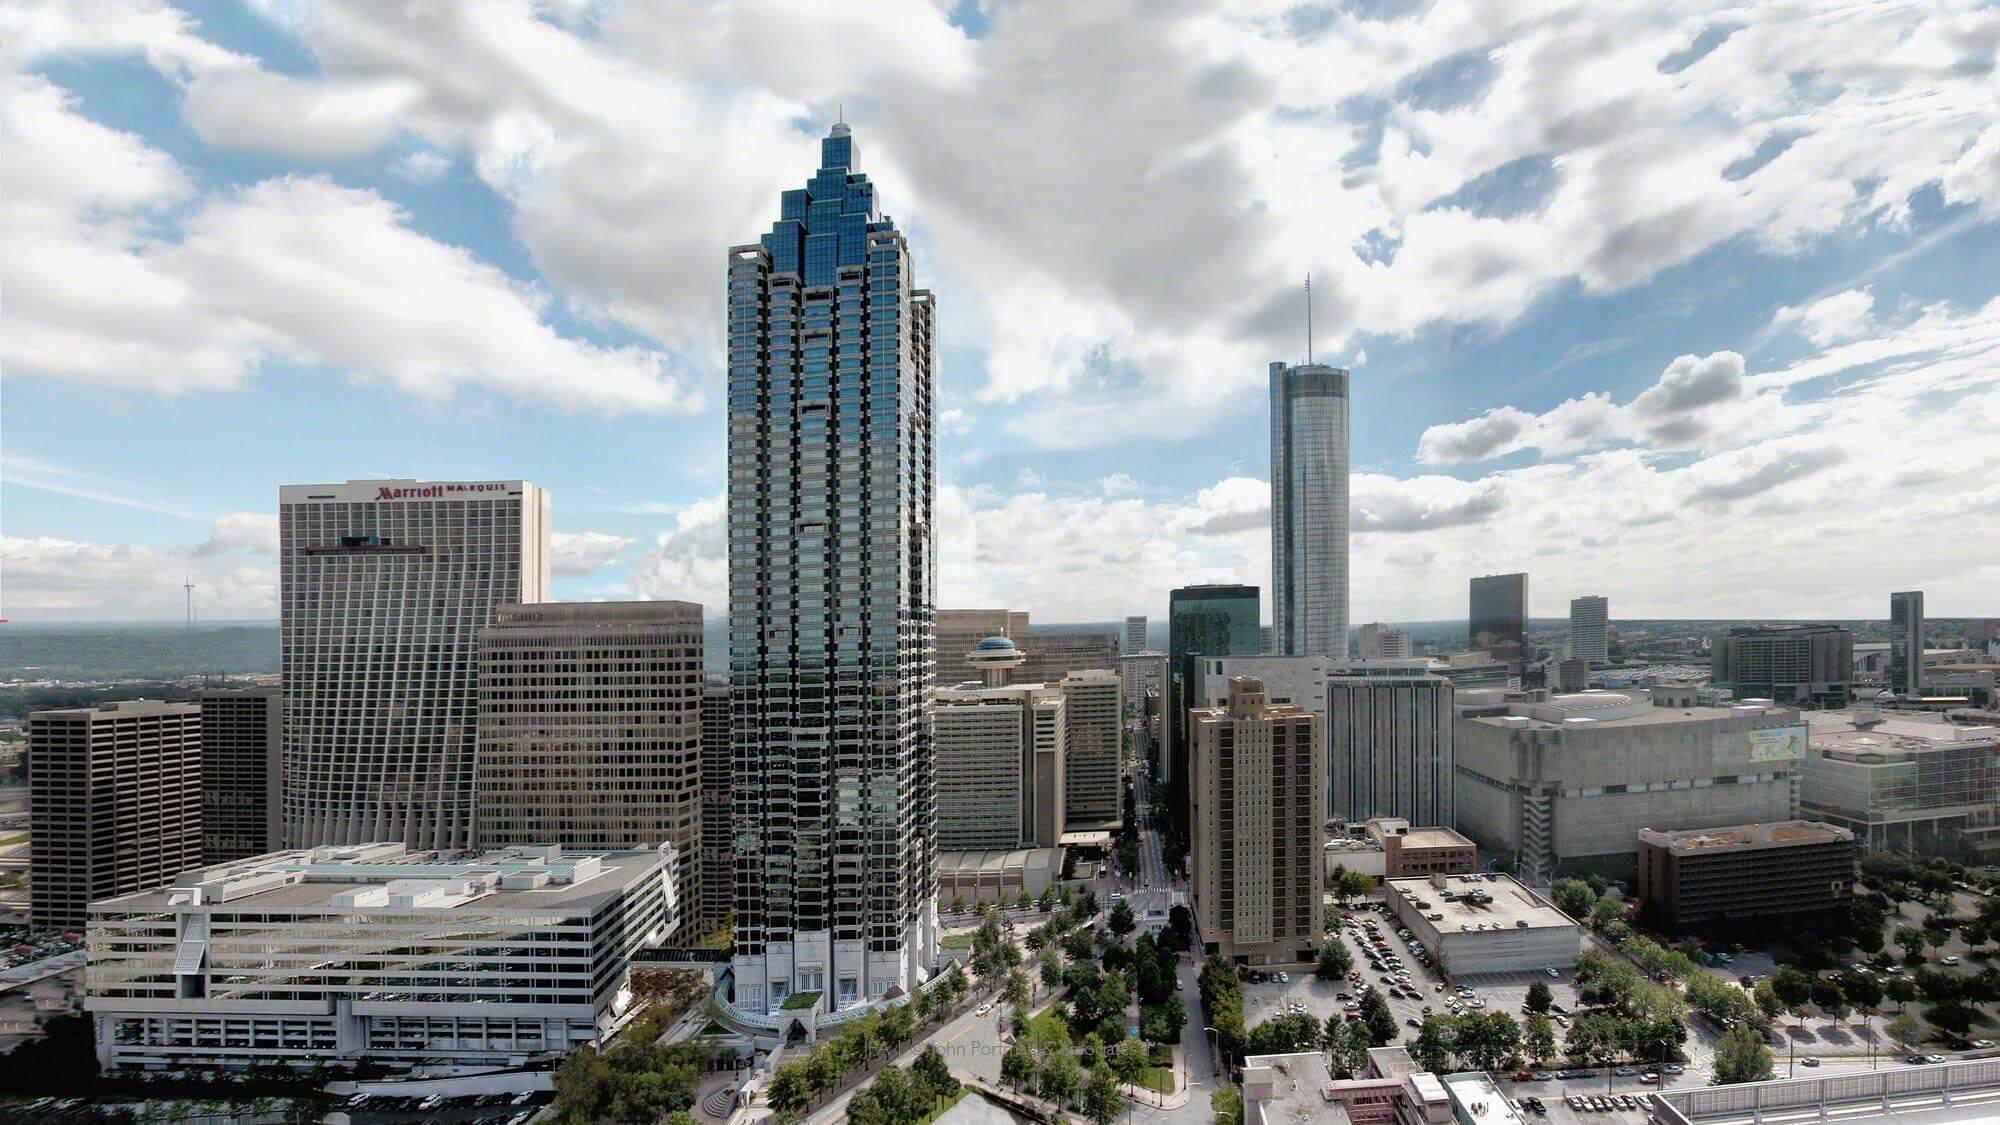 Buildings in Downtown Atlanta designed and built by John Portman.